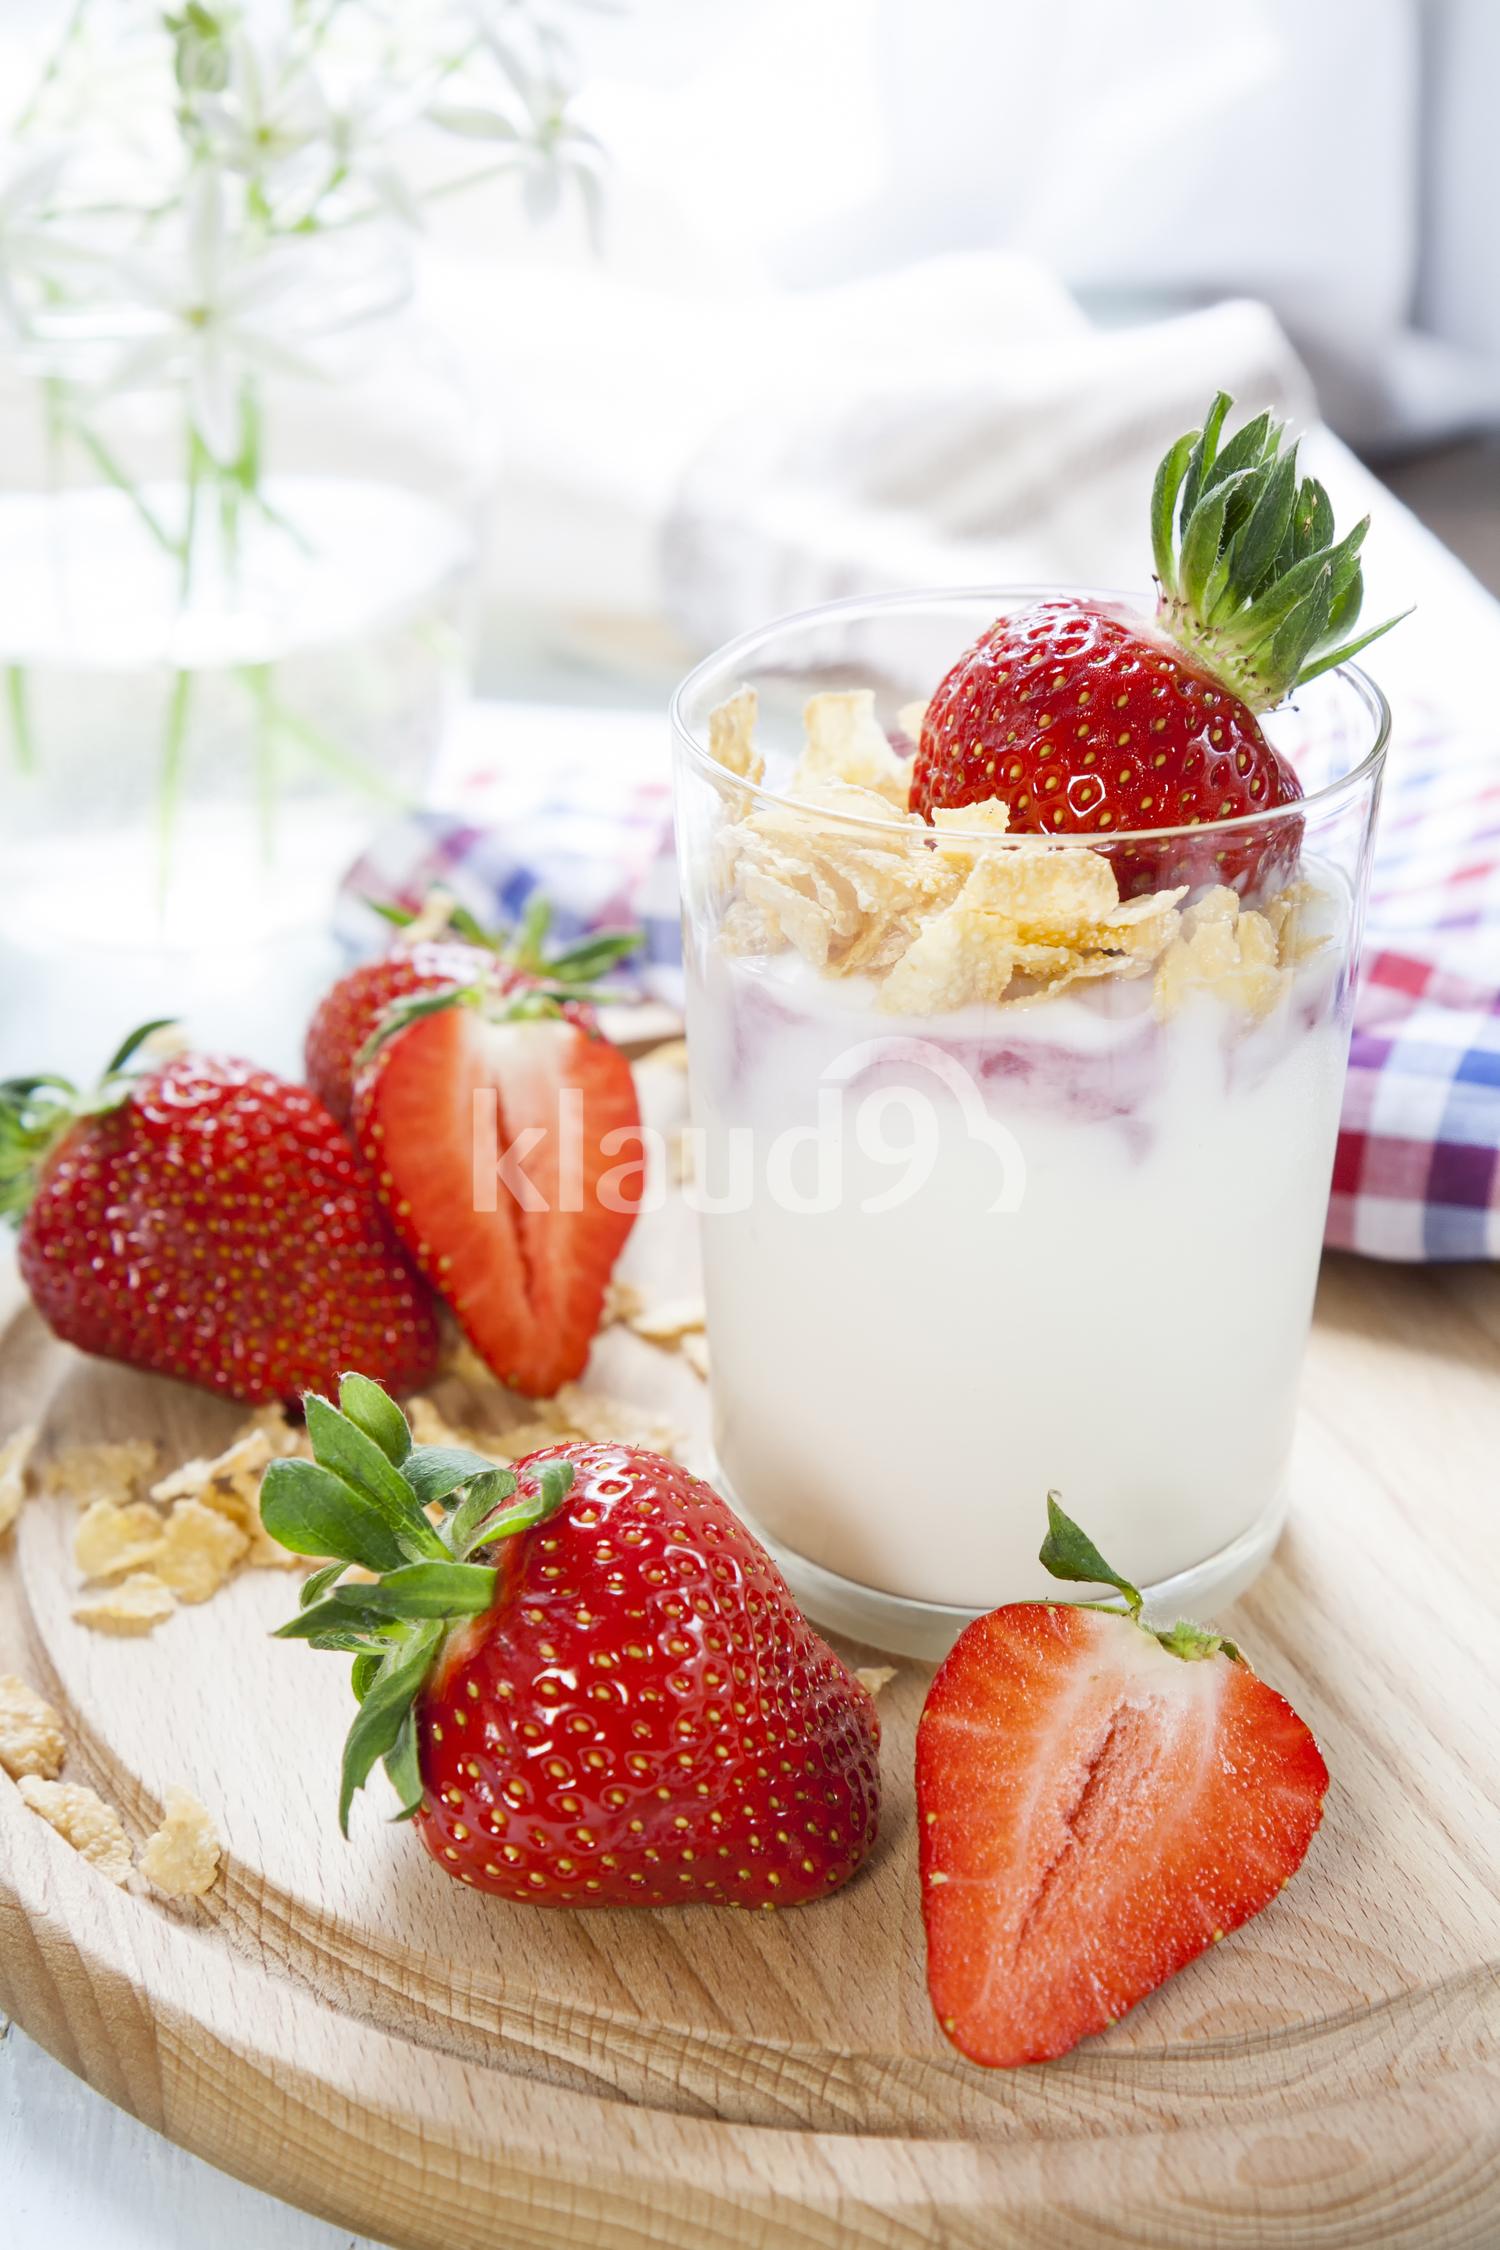 Yogurt with fresh fruits and milk